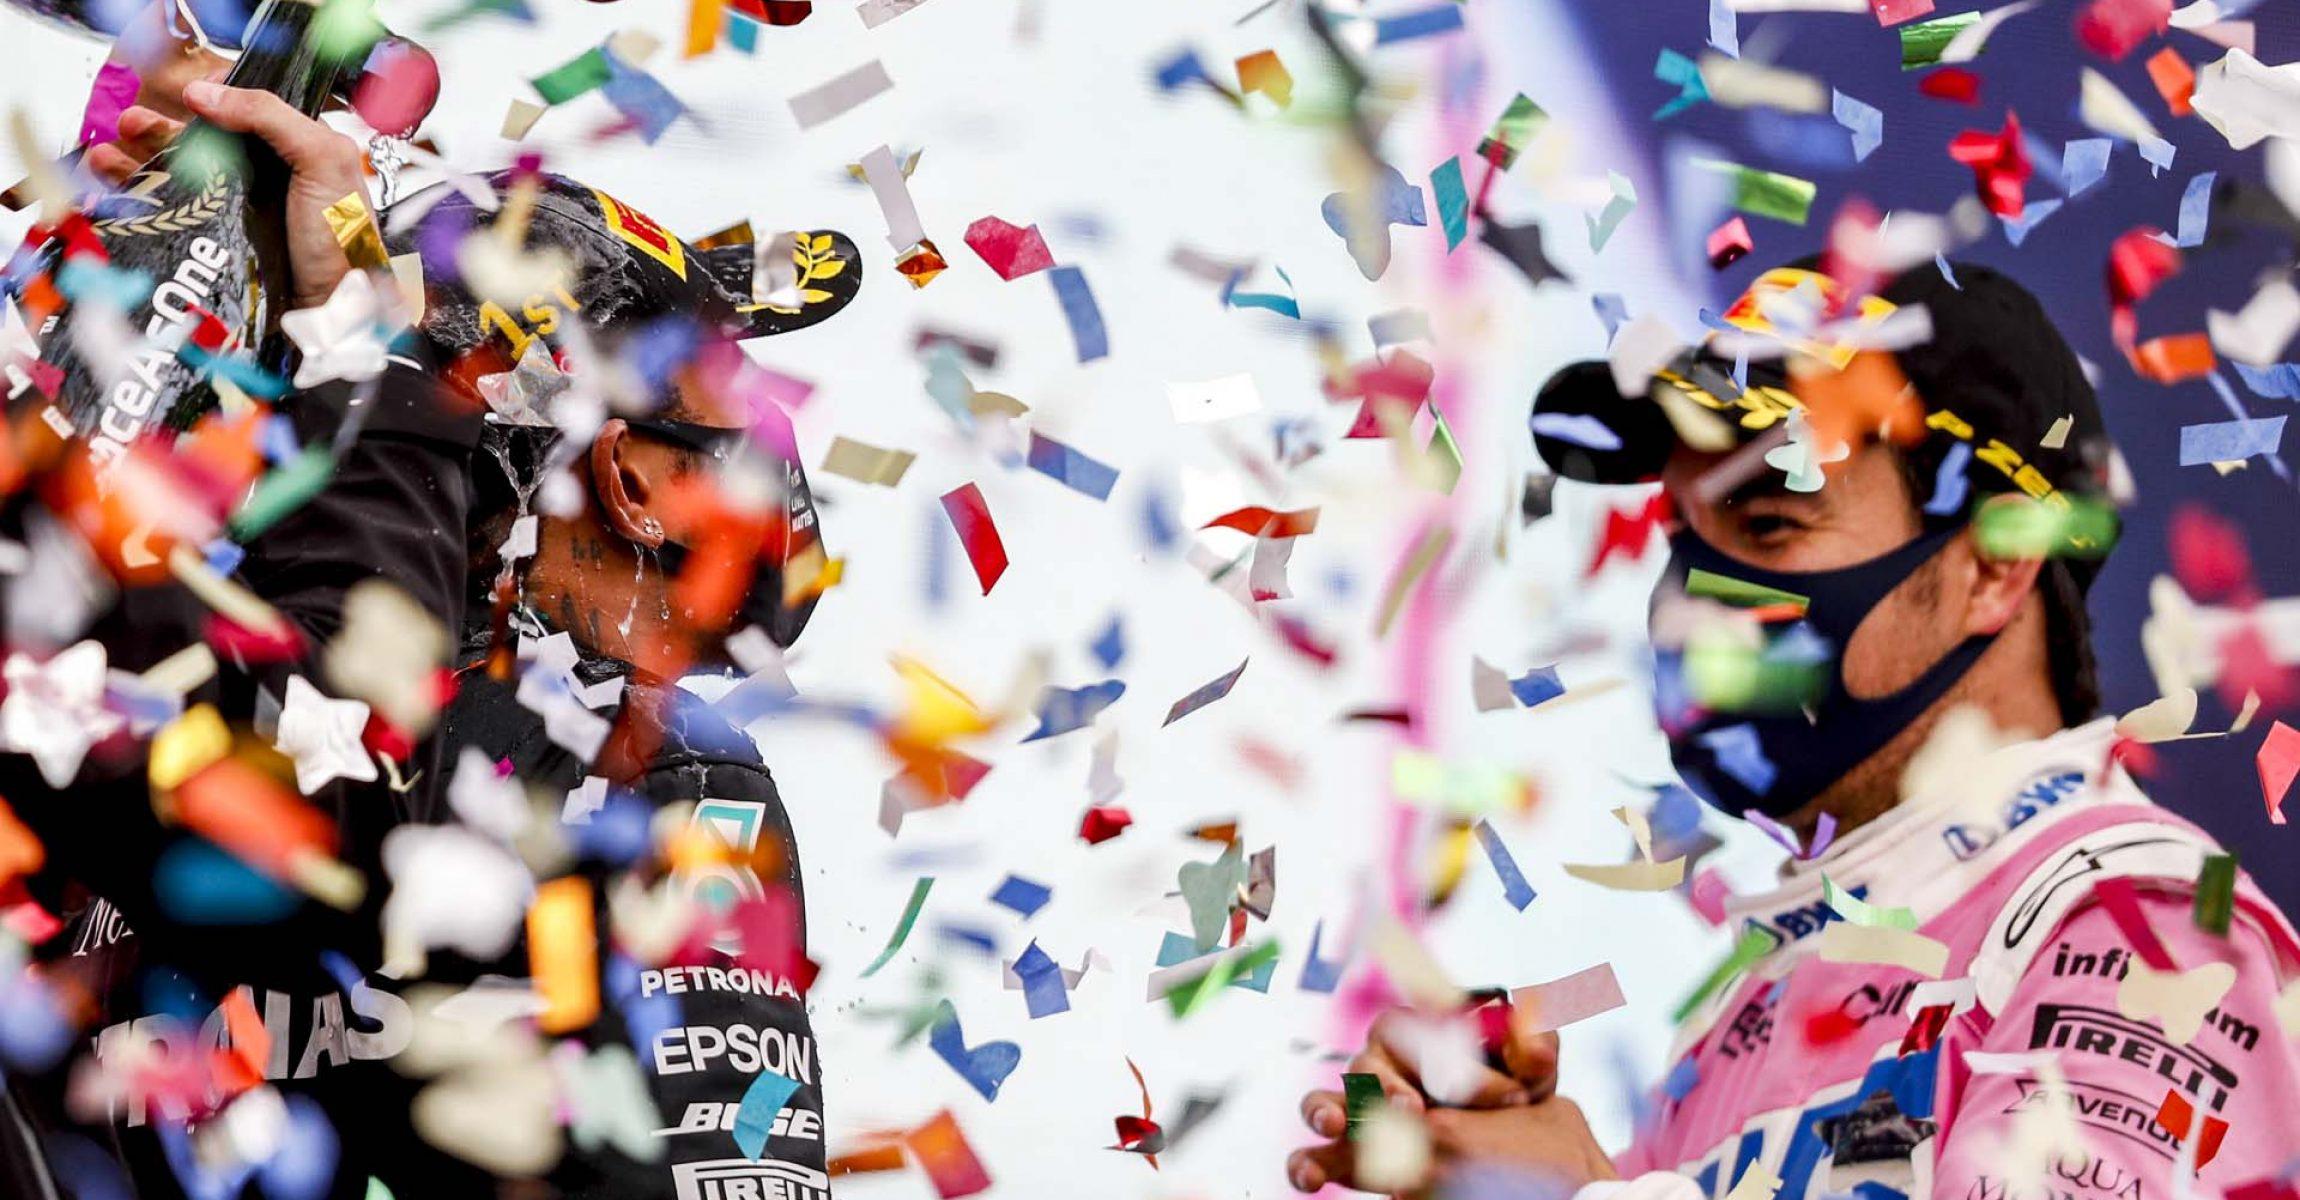 Lewis Hamilton, Mercedes-AMG Petronas F1, 1st position, and Sergio Perez, Racing Point, 2nd position, celebrates on the podium